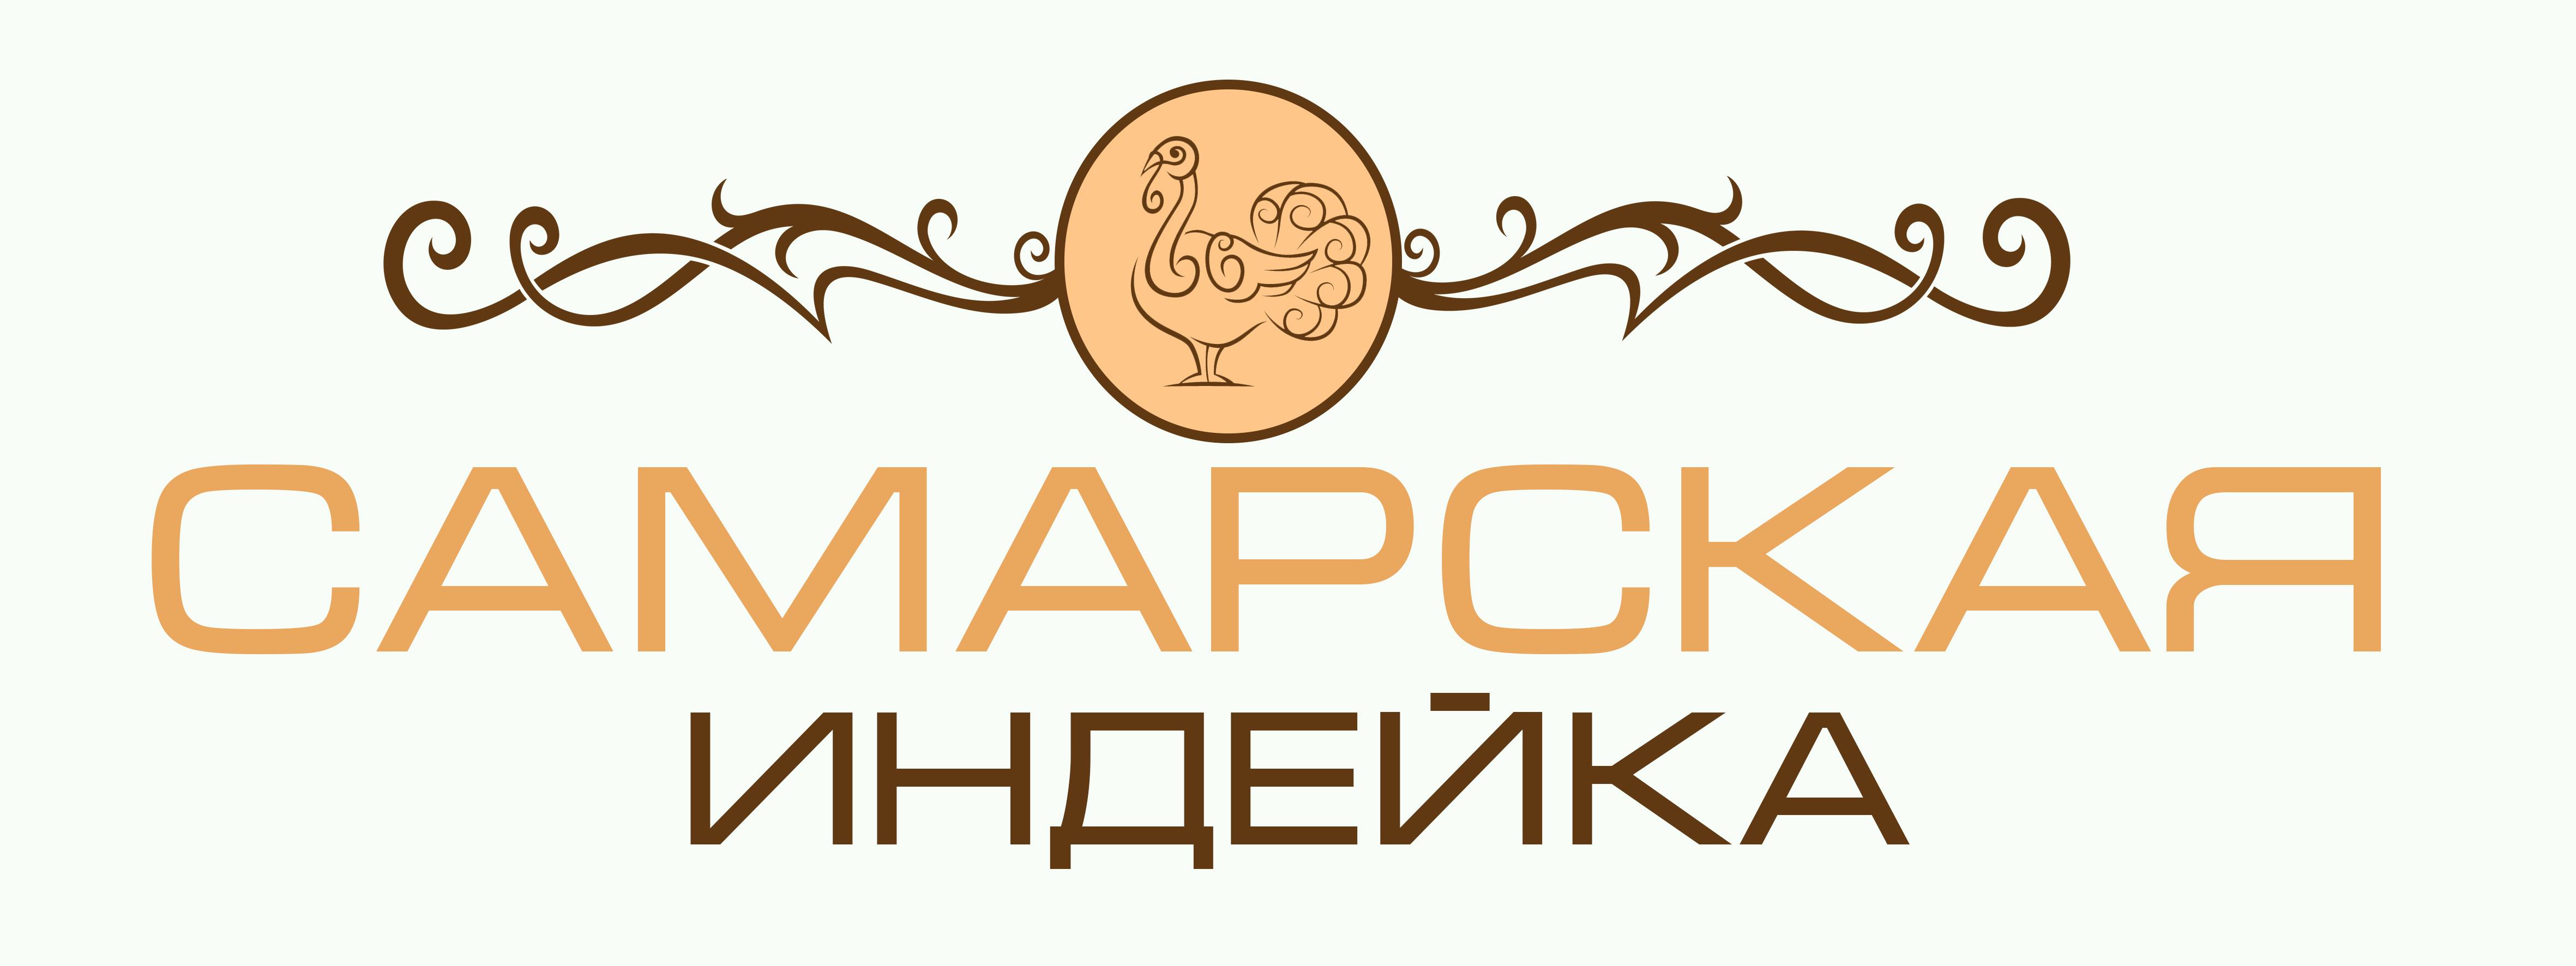 Создание логотипа Сельхоз производителя фото f_52255e0080203ede.jpg